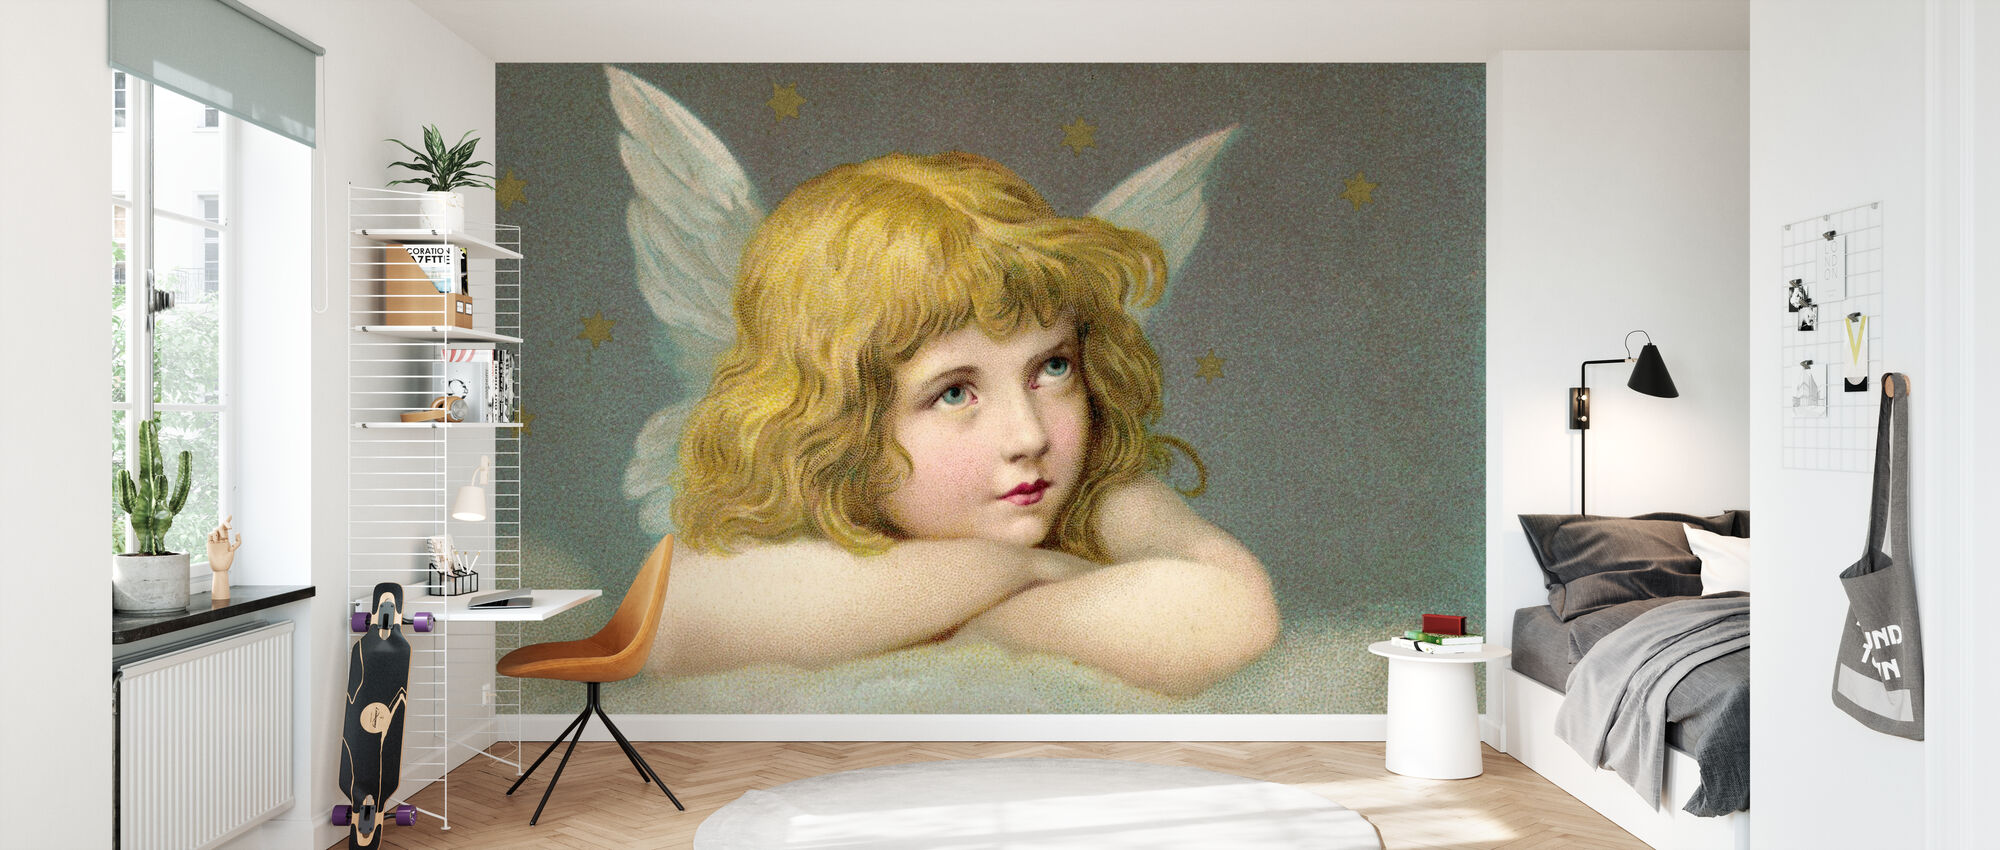 Little Angel - Wallpaper - Kids Room